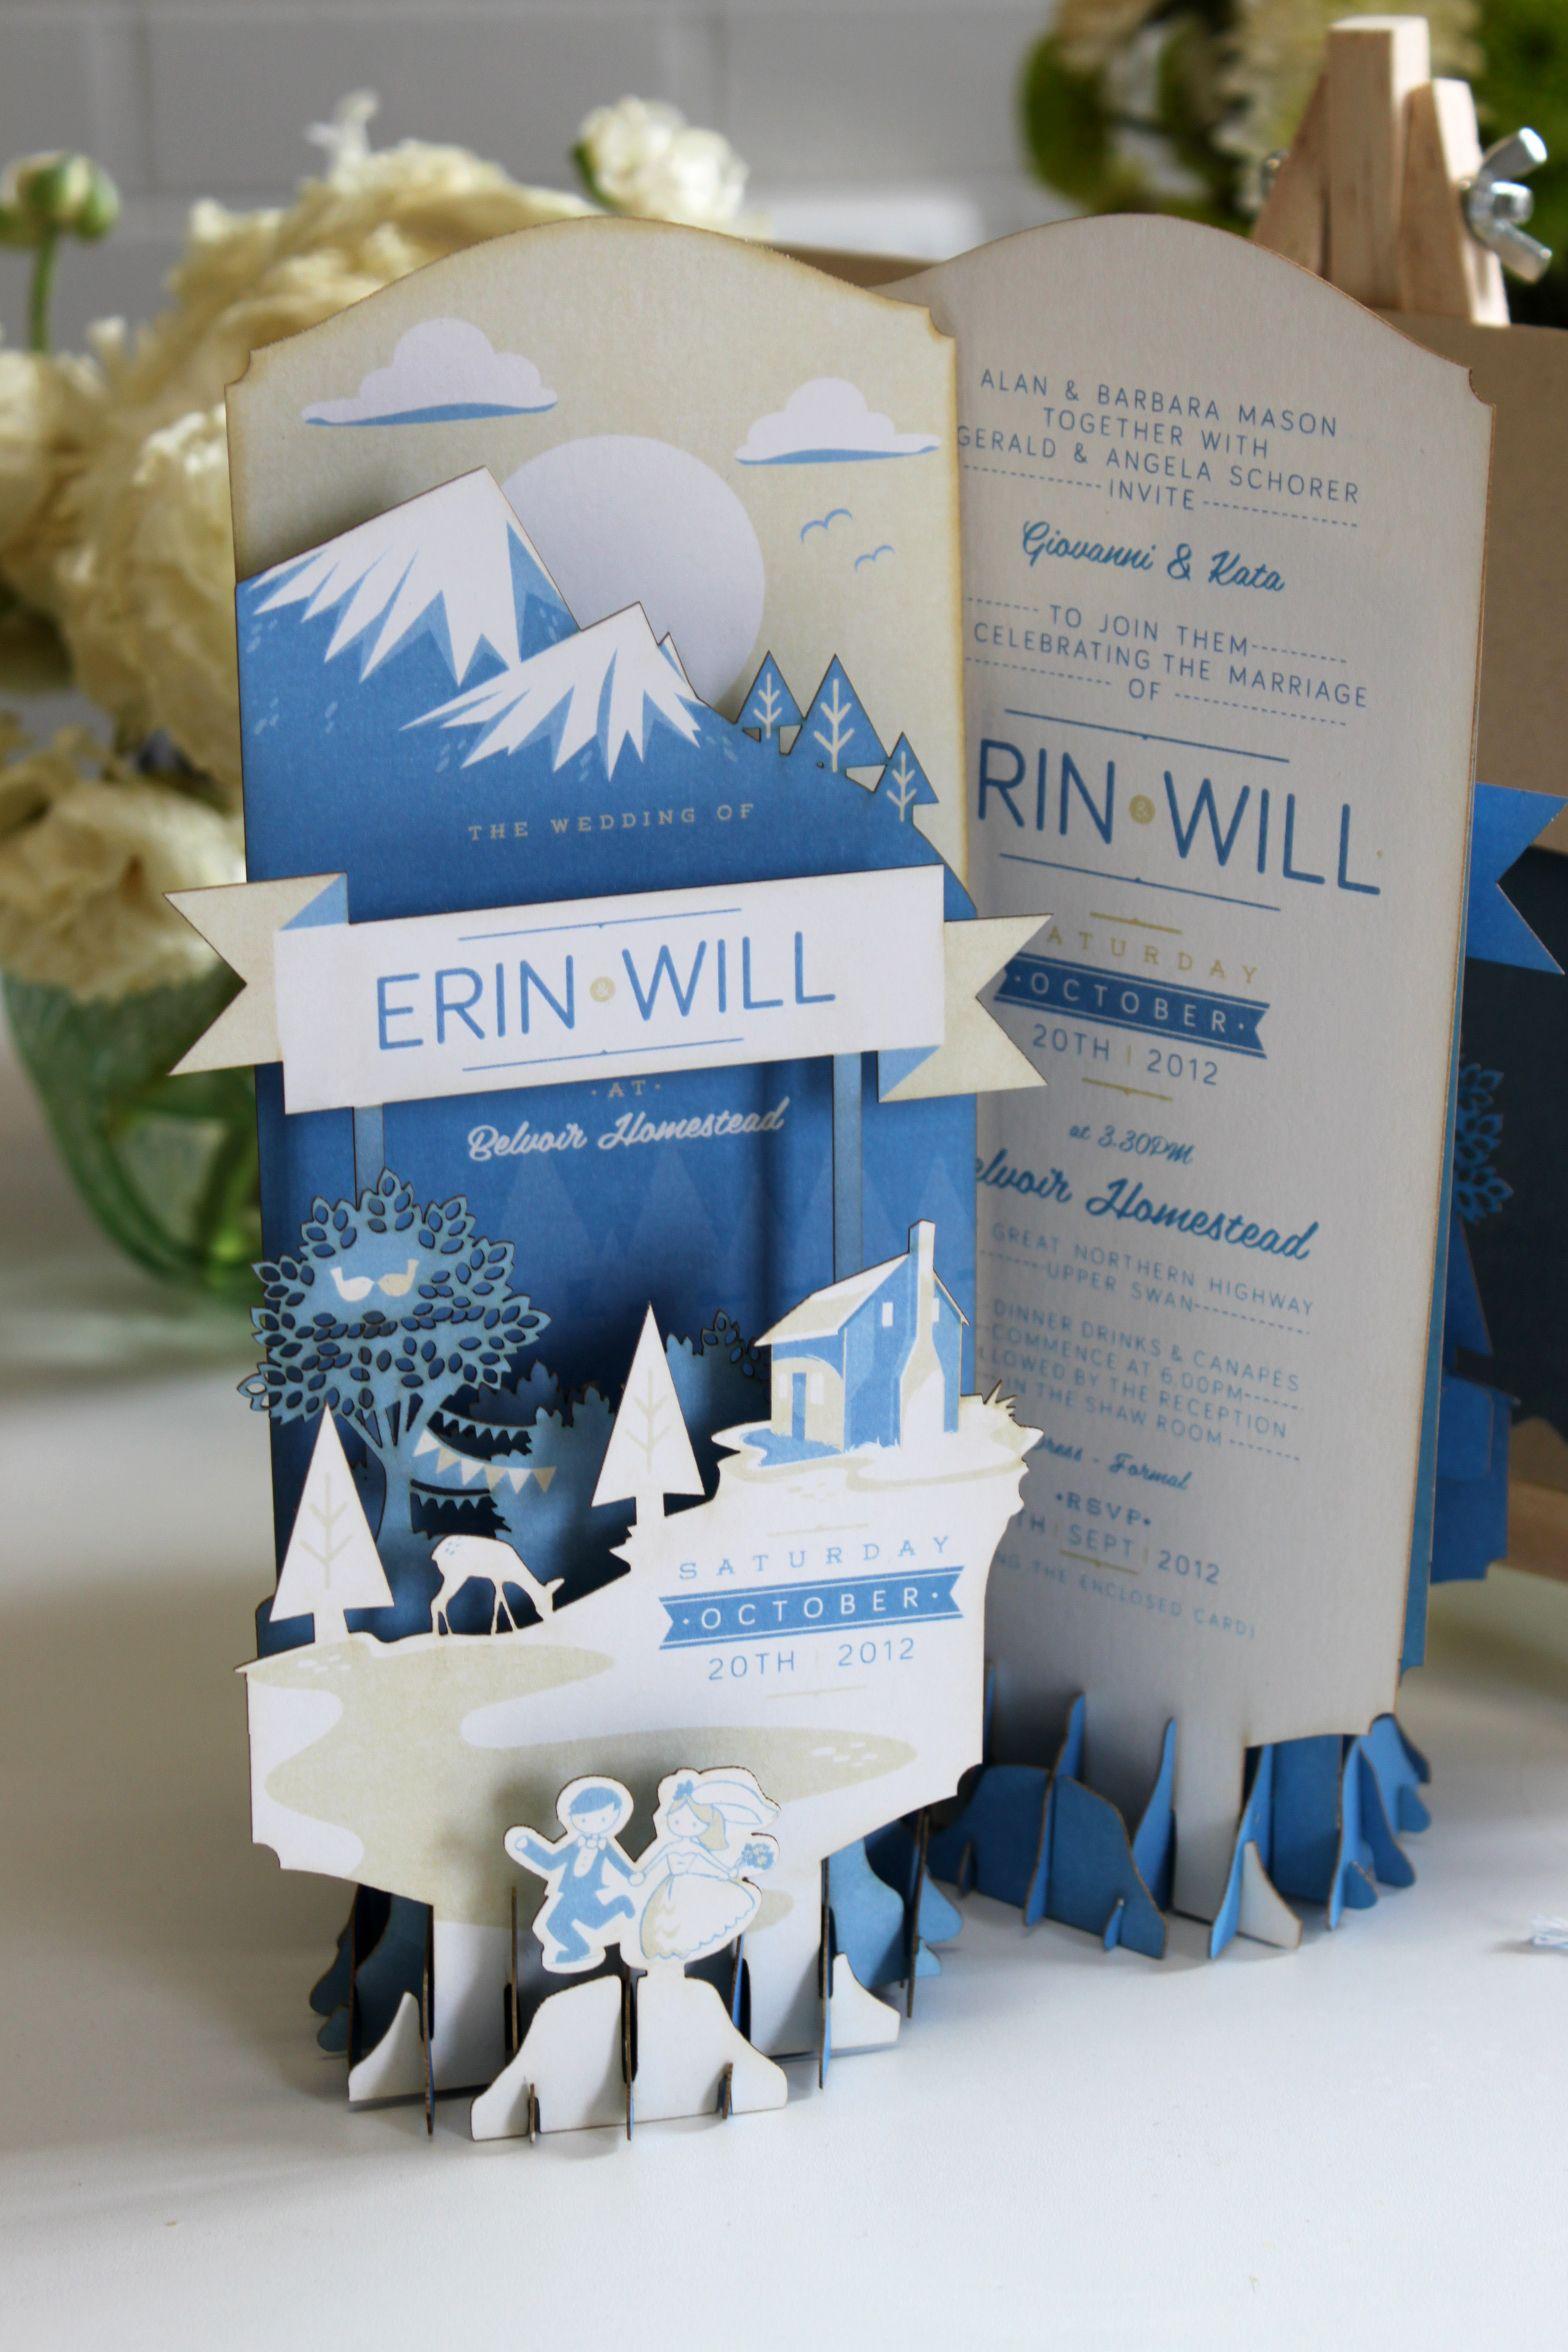 3D Wedding Invitations (BridesMagazine.co.uk)   Wedding, Wedding and ...